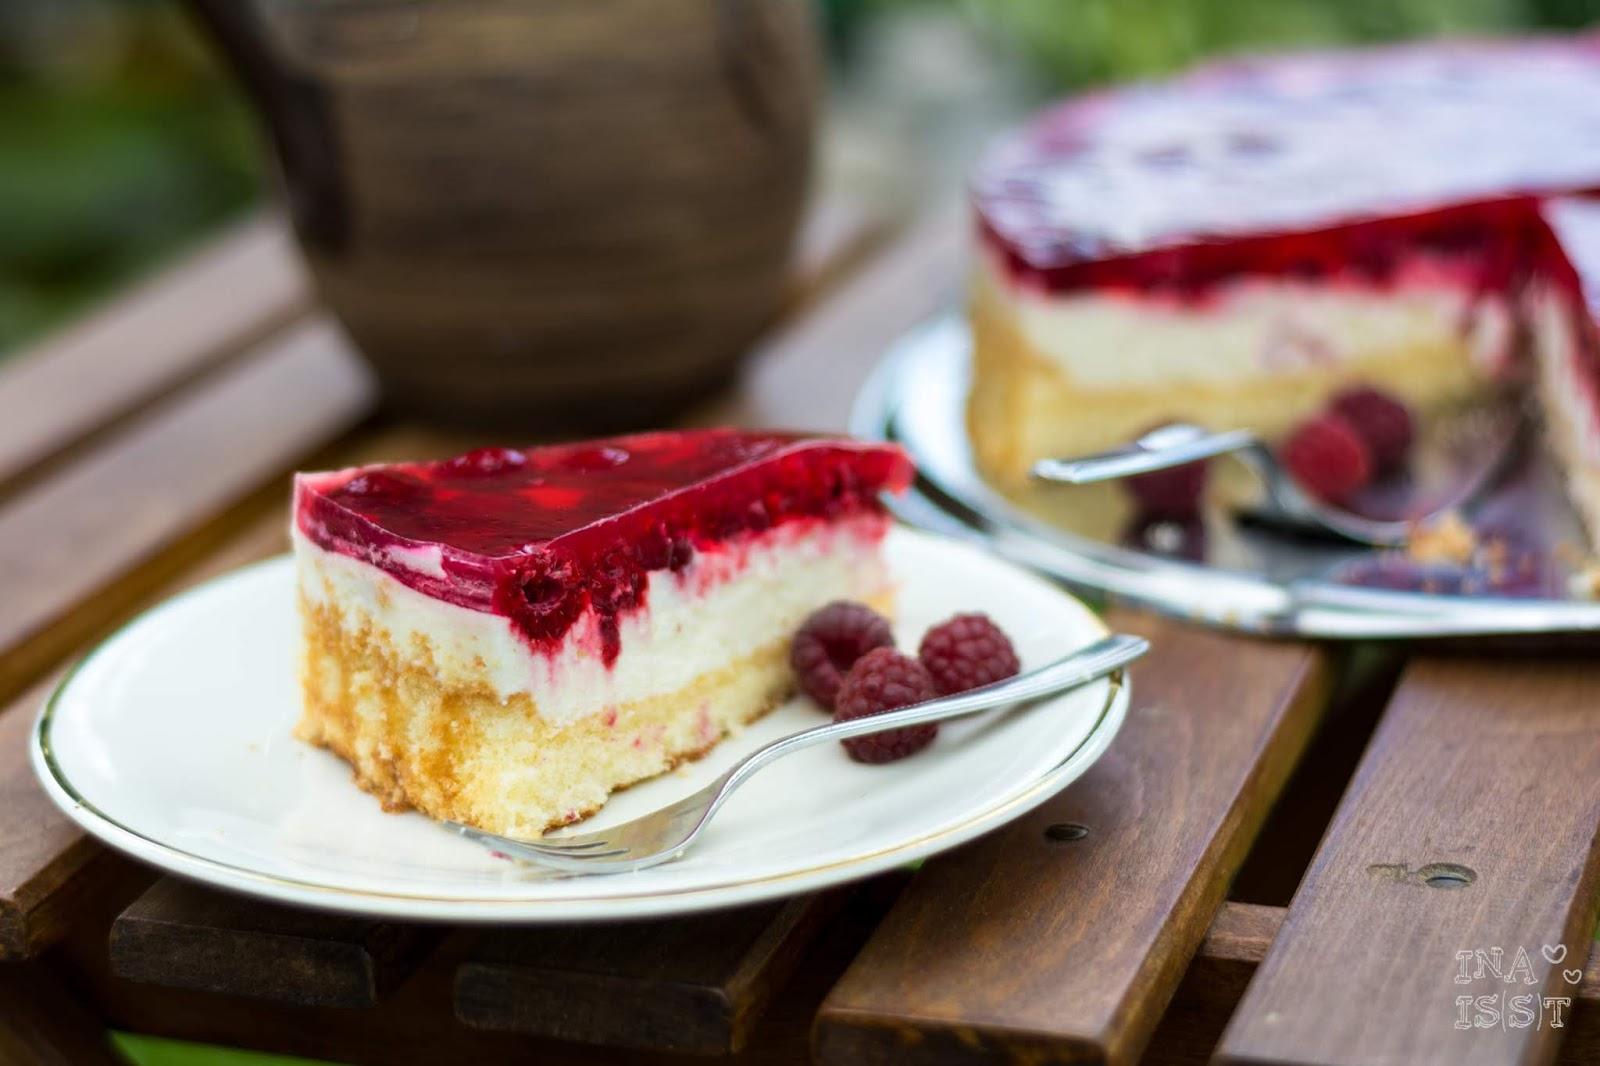 Rezept für Omas Himbeer-Joghurt-Torte, Torte im Sommer